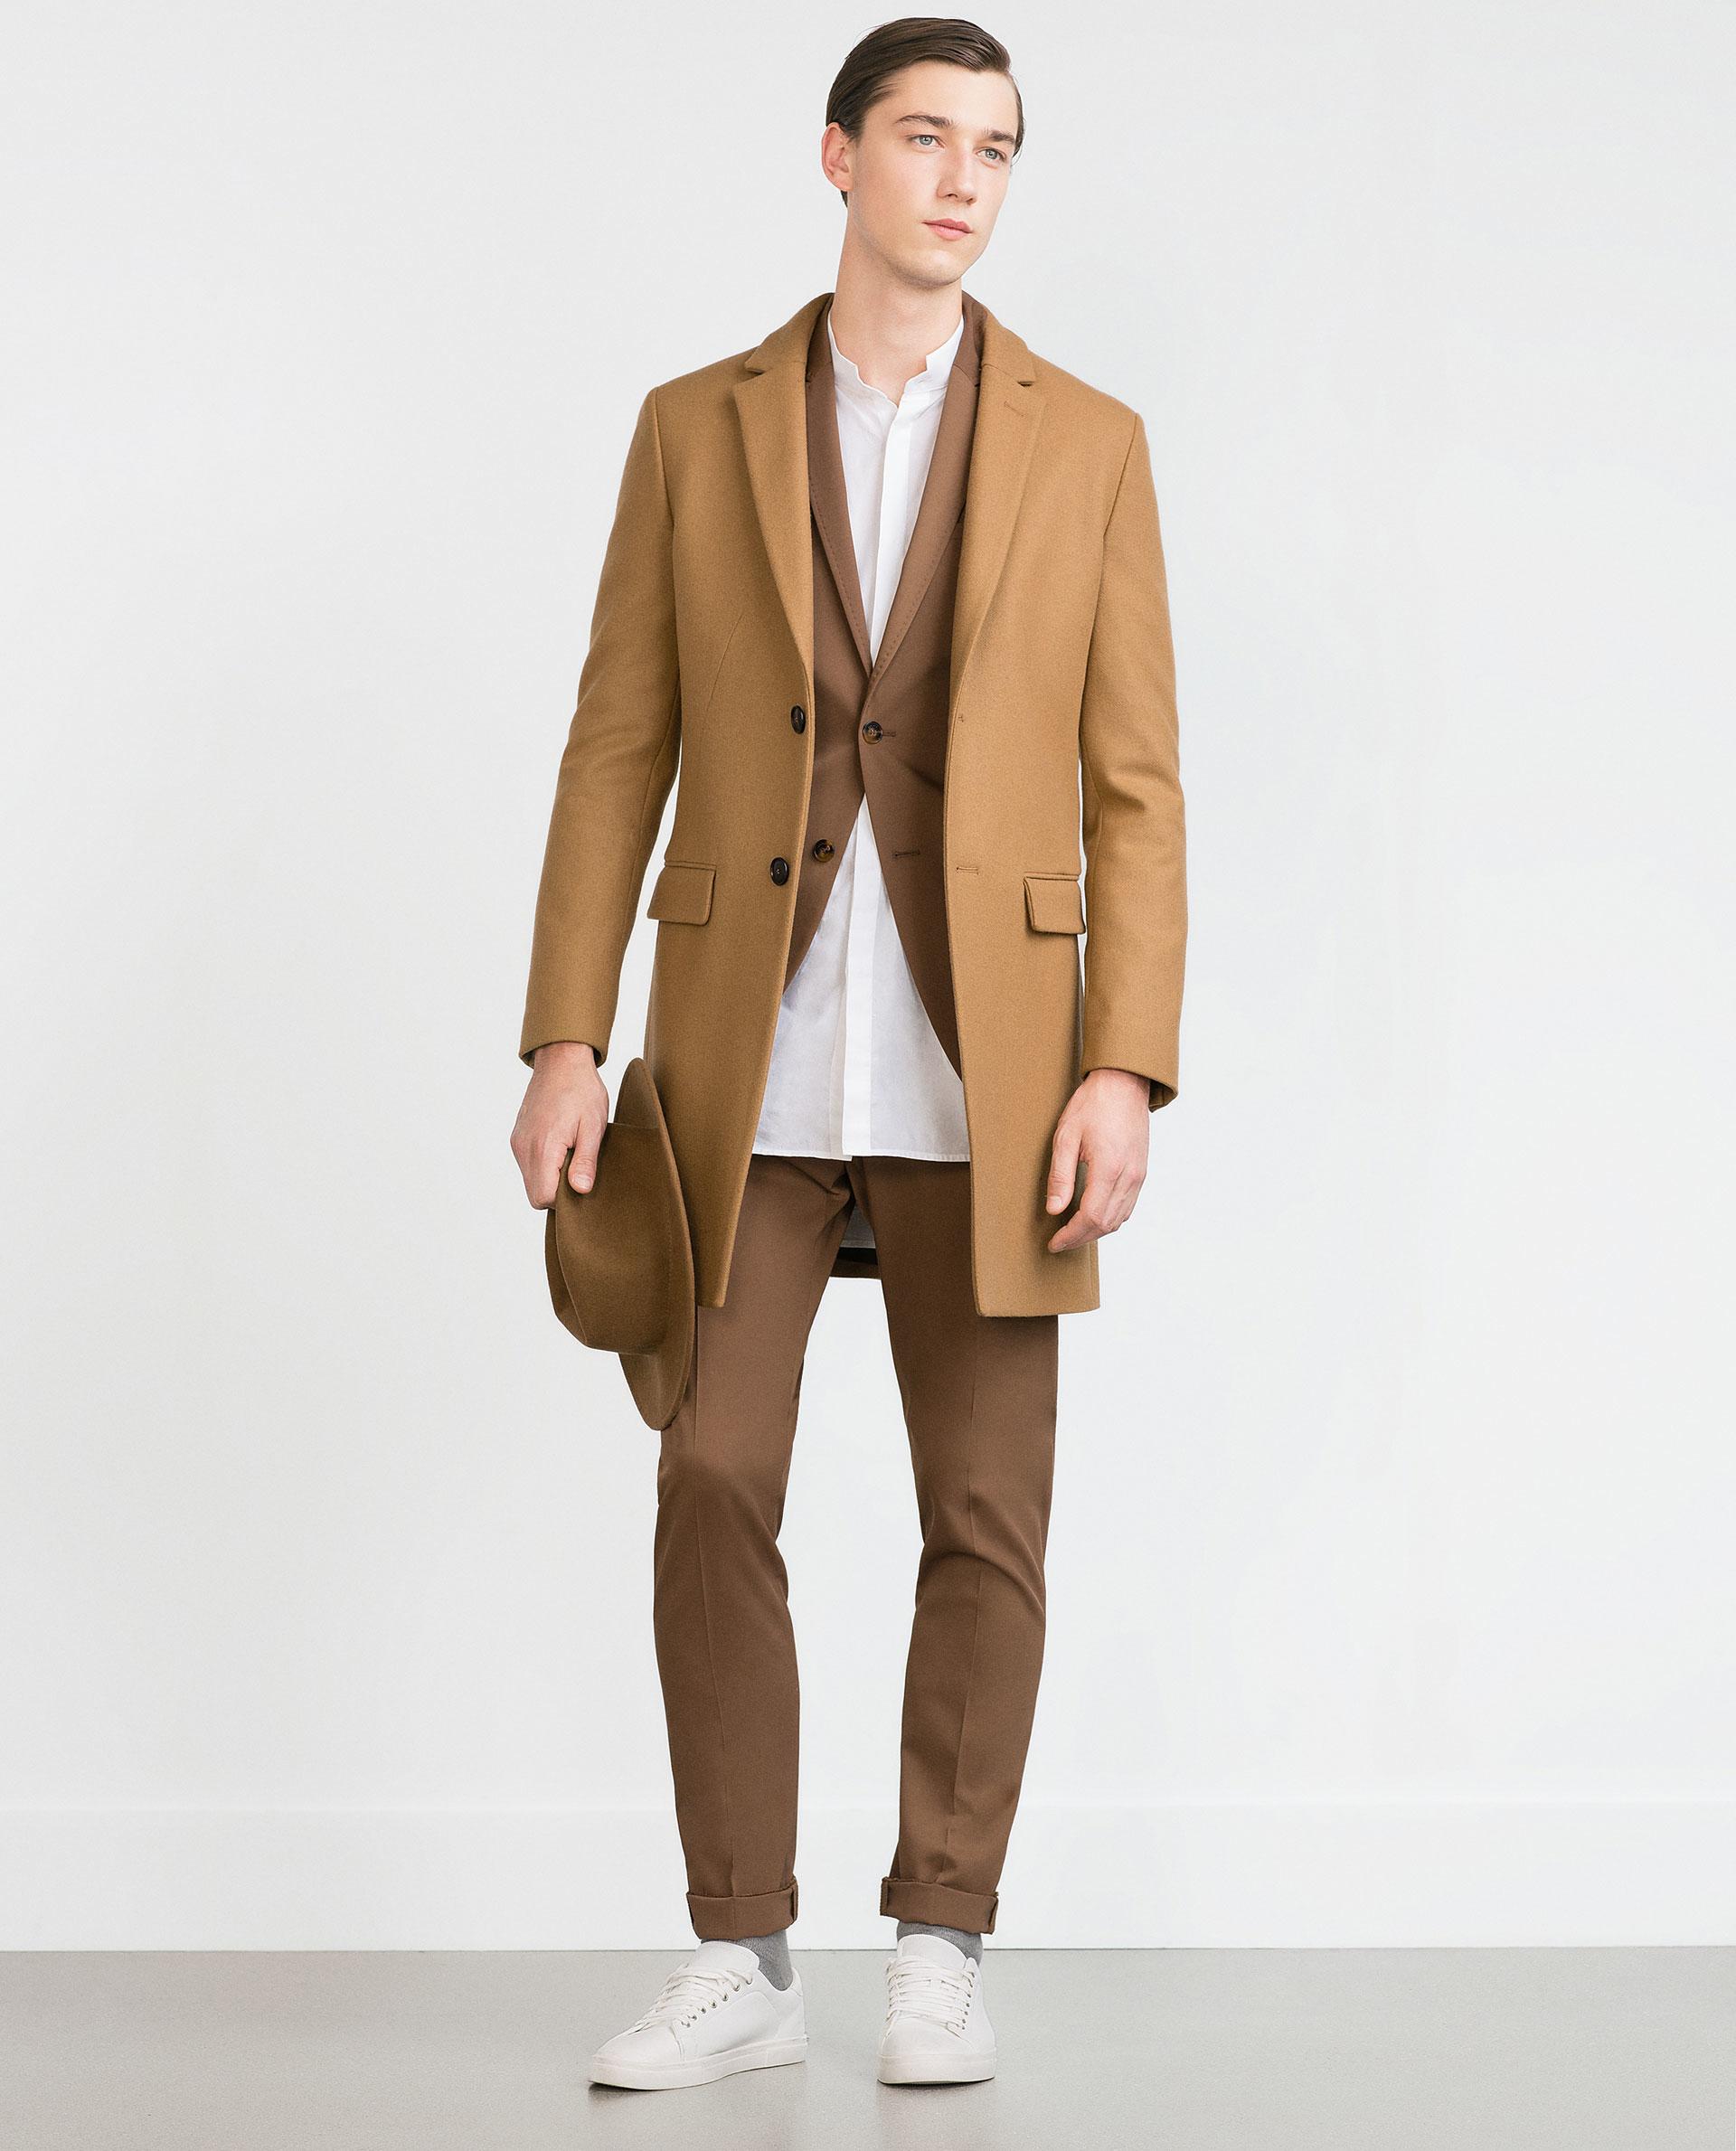 Zara Camel Coat in Natural for Men | Lyst